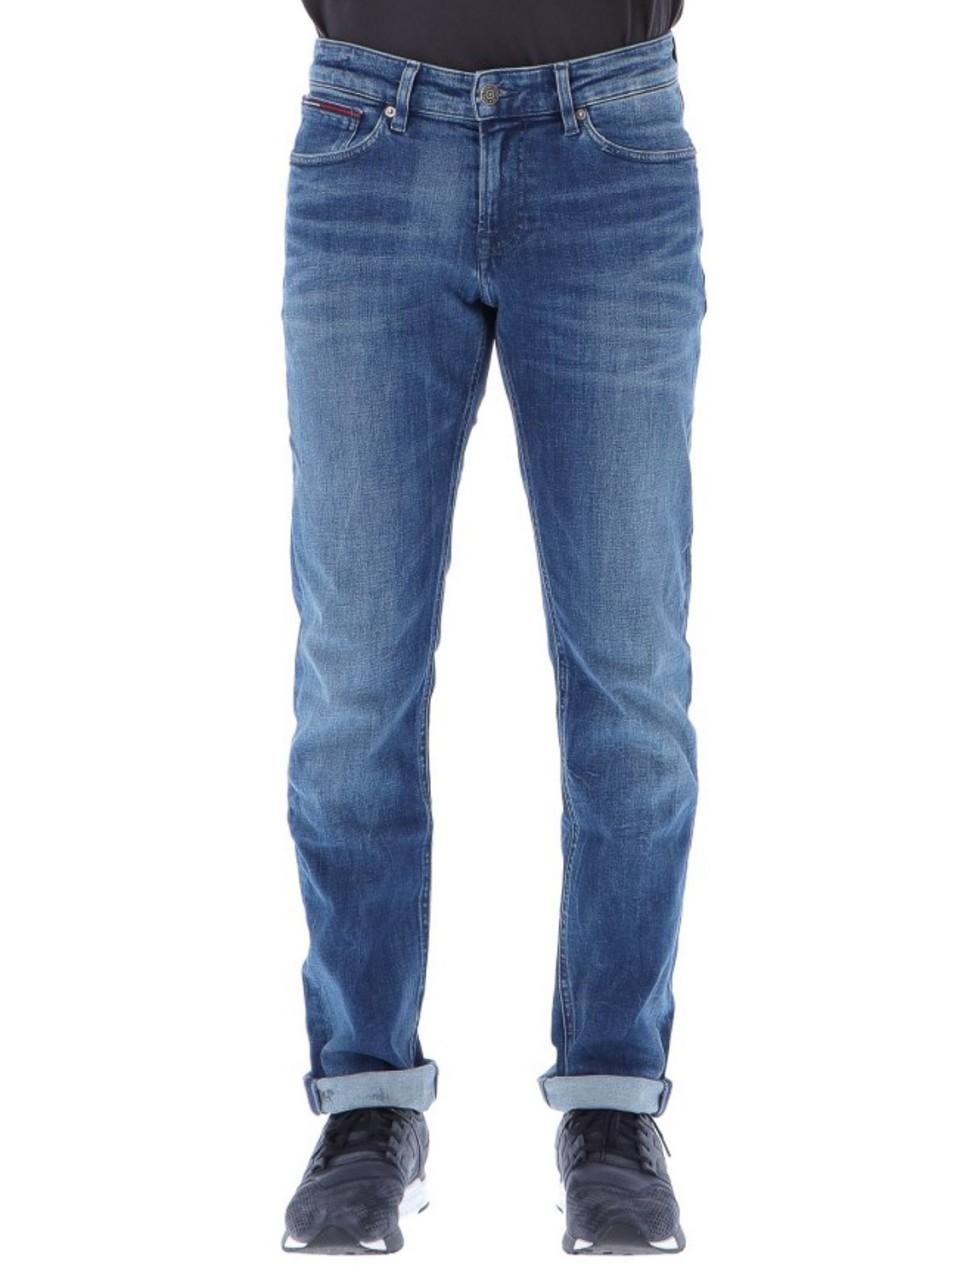 Tommy hilfiger Uomo Jeans Tommy Hilfiger Uomo Scanton Slim 04593I